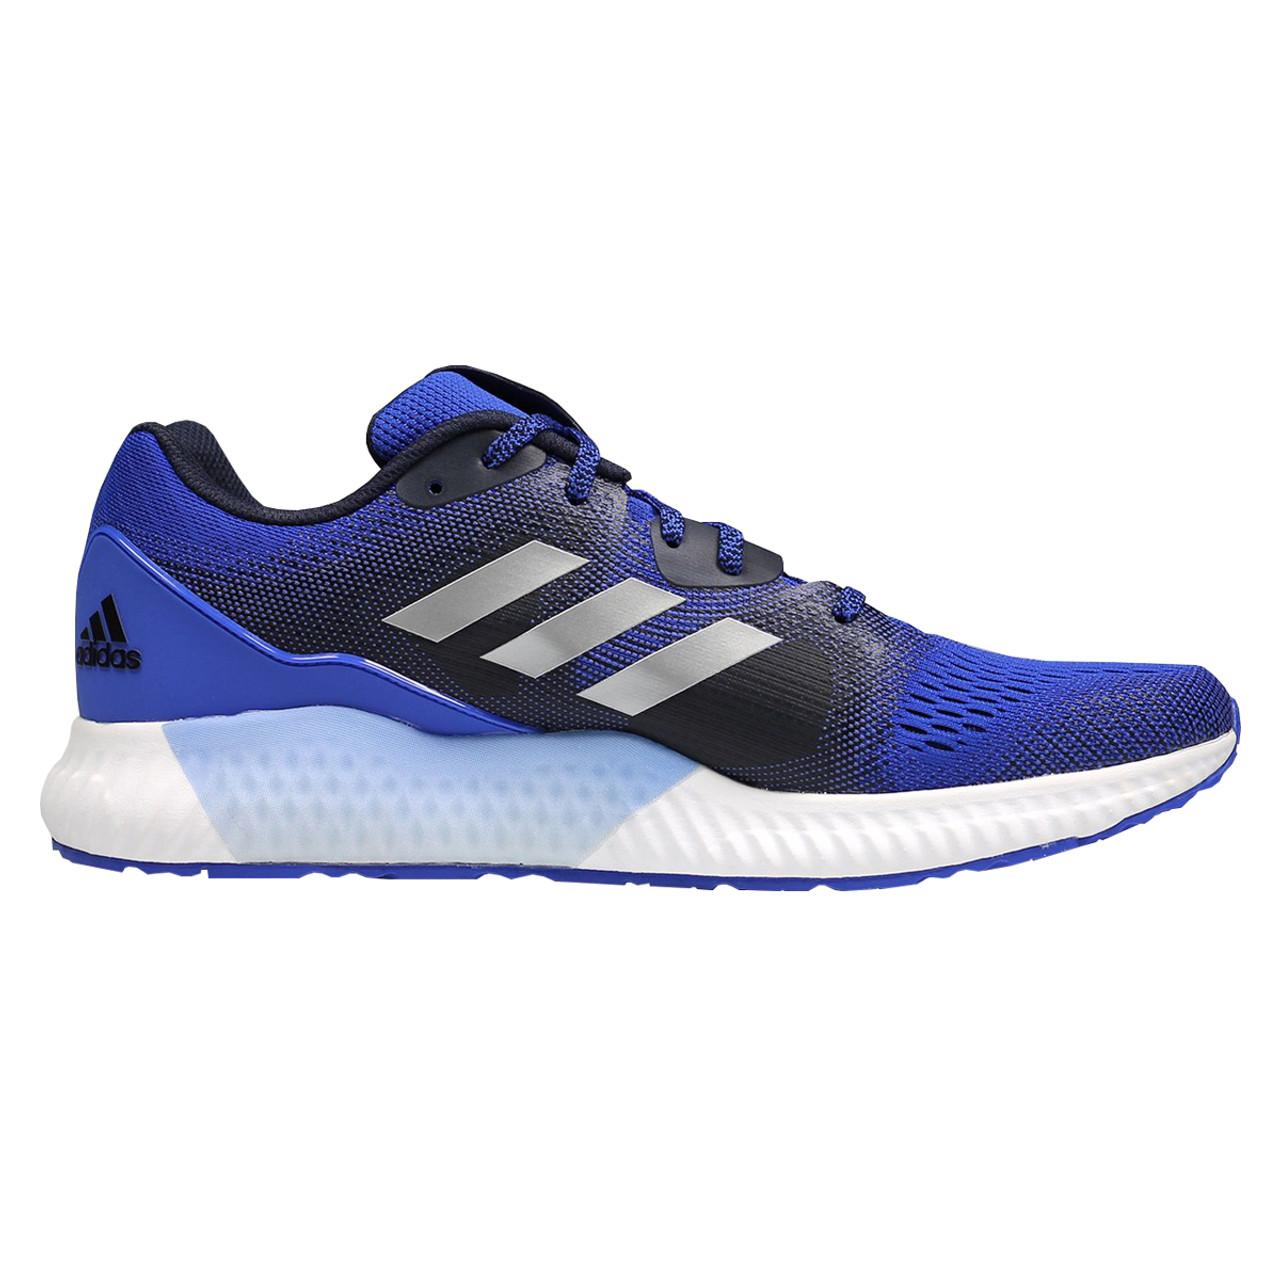 huge sale cc41f bbc8e Adidas Aerobounce ST Men's Sneakers CG4615 - Blue, Silver, Navy